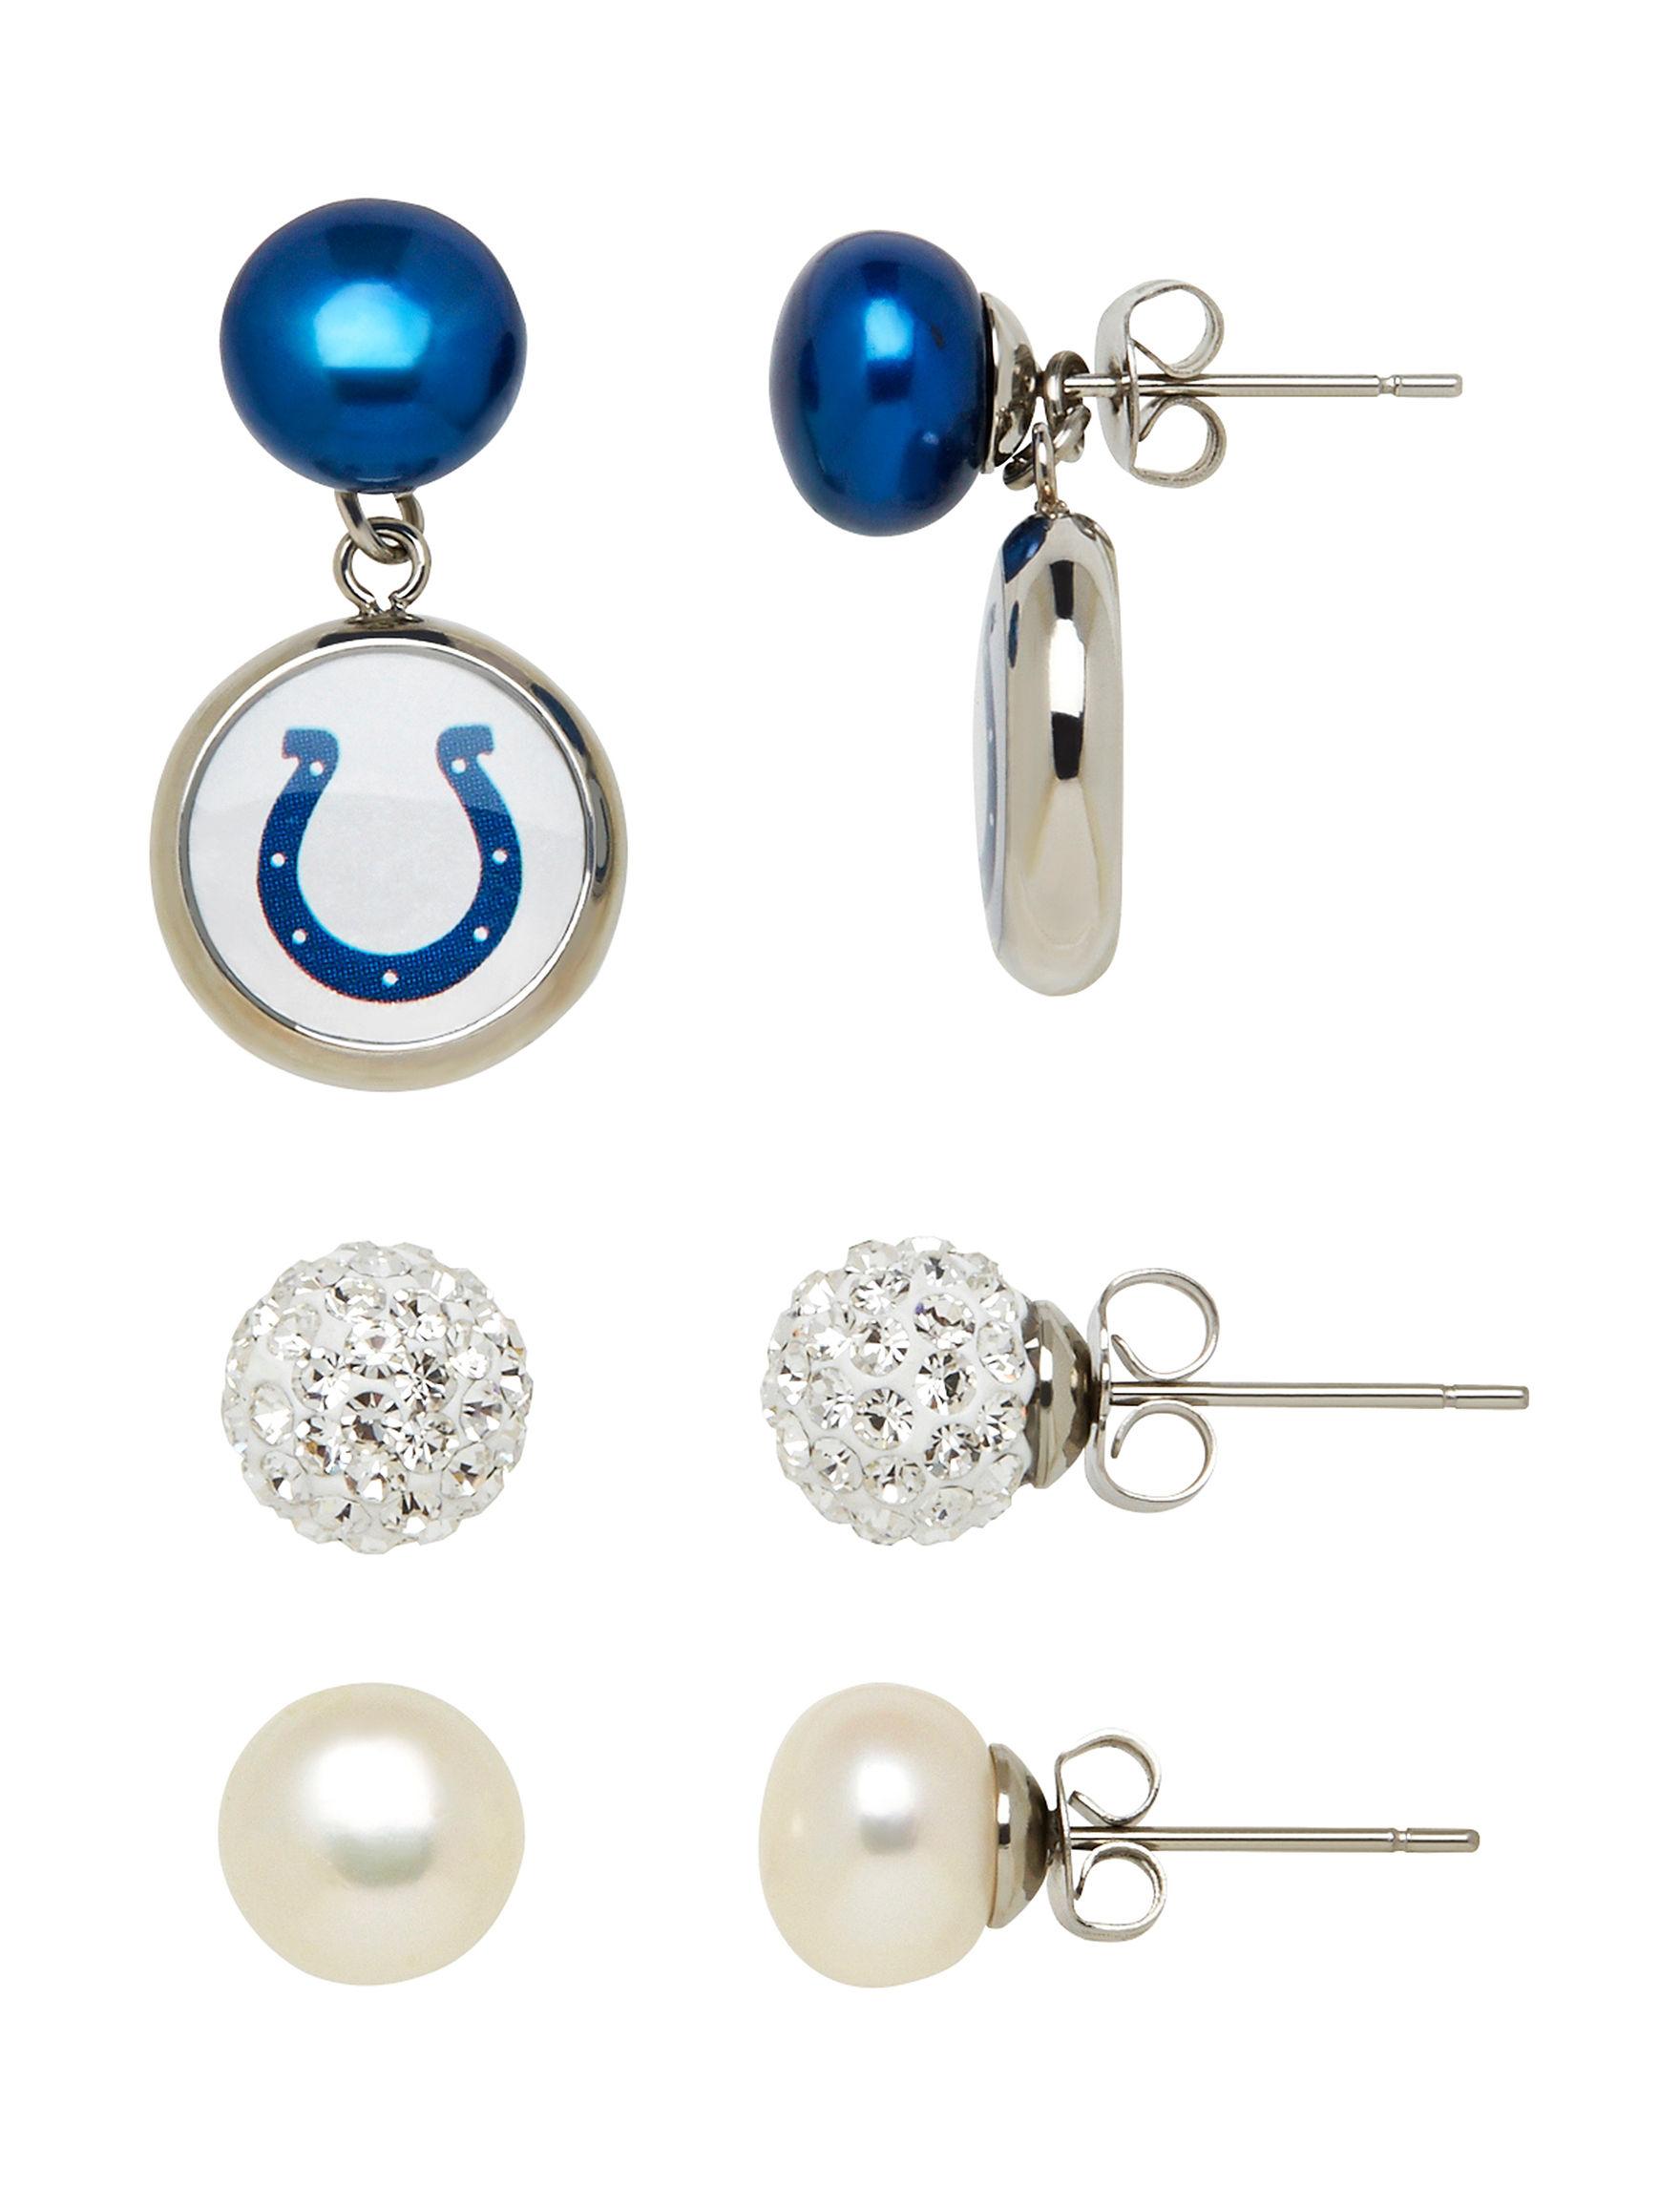 Aurafin Oro America White / Blue Studs Earrings Fashion Jewelry Fine Jewelry NFL